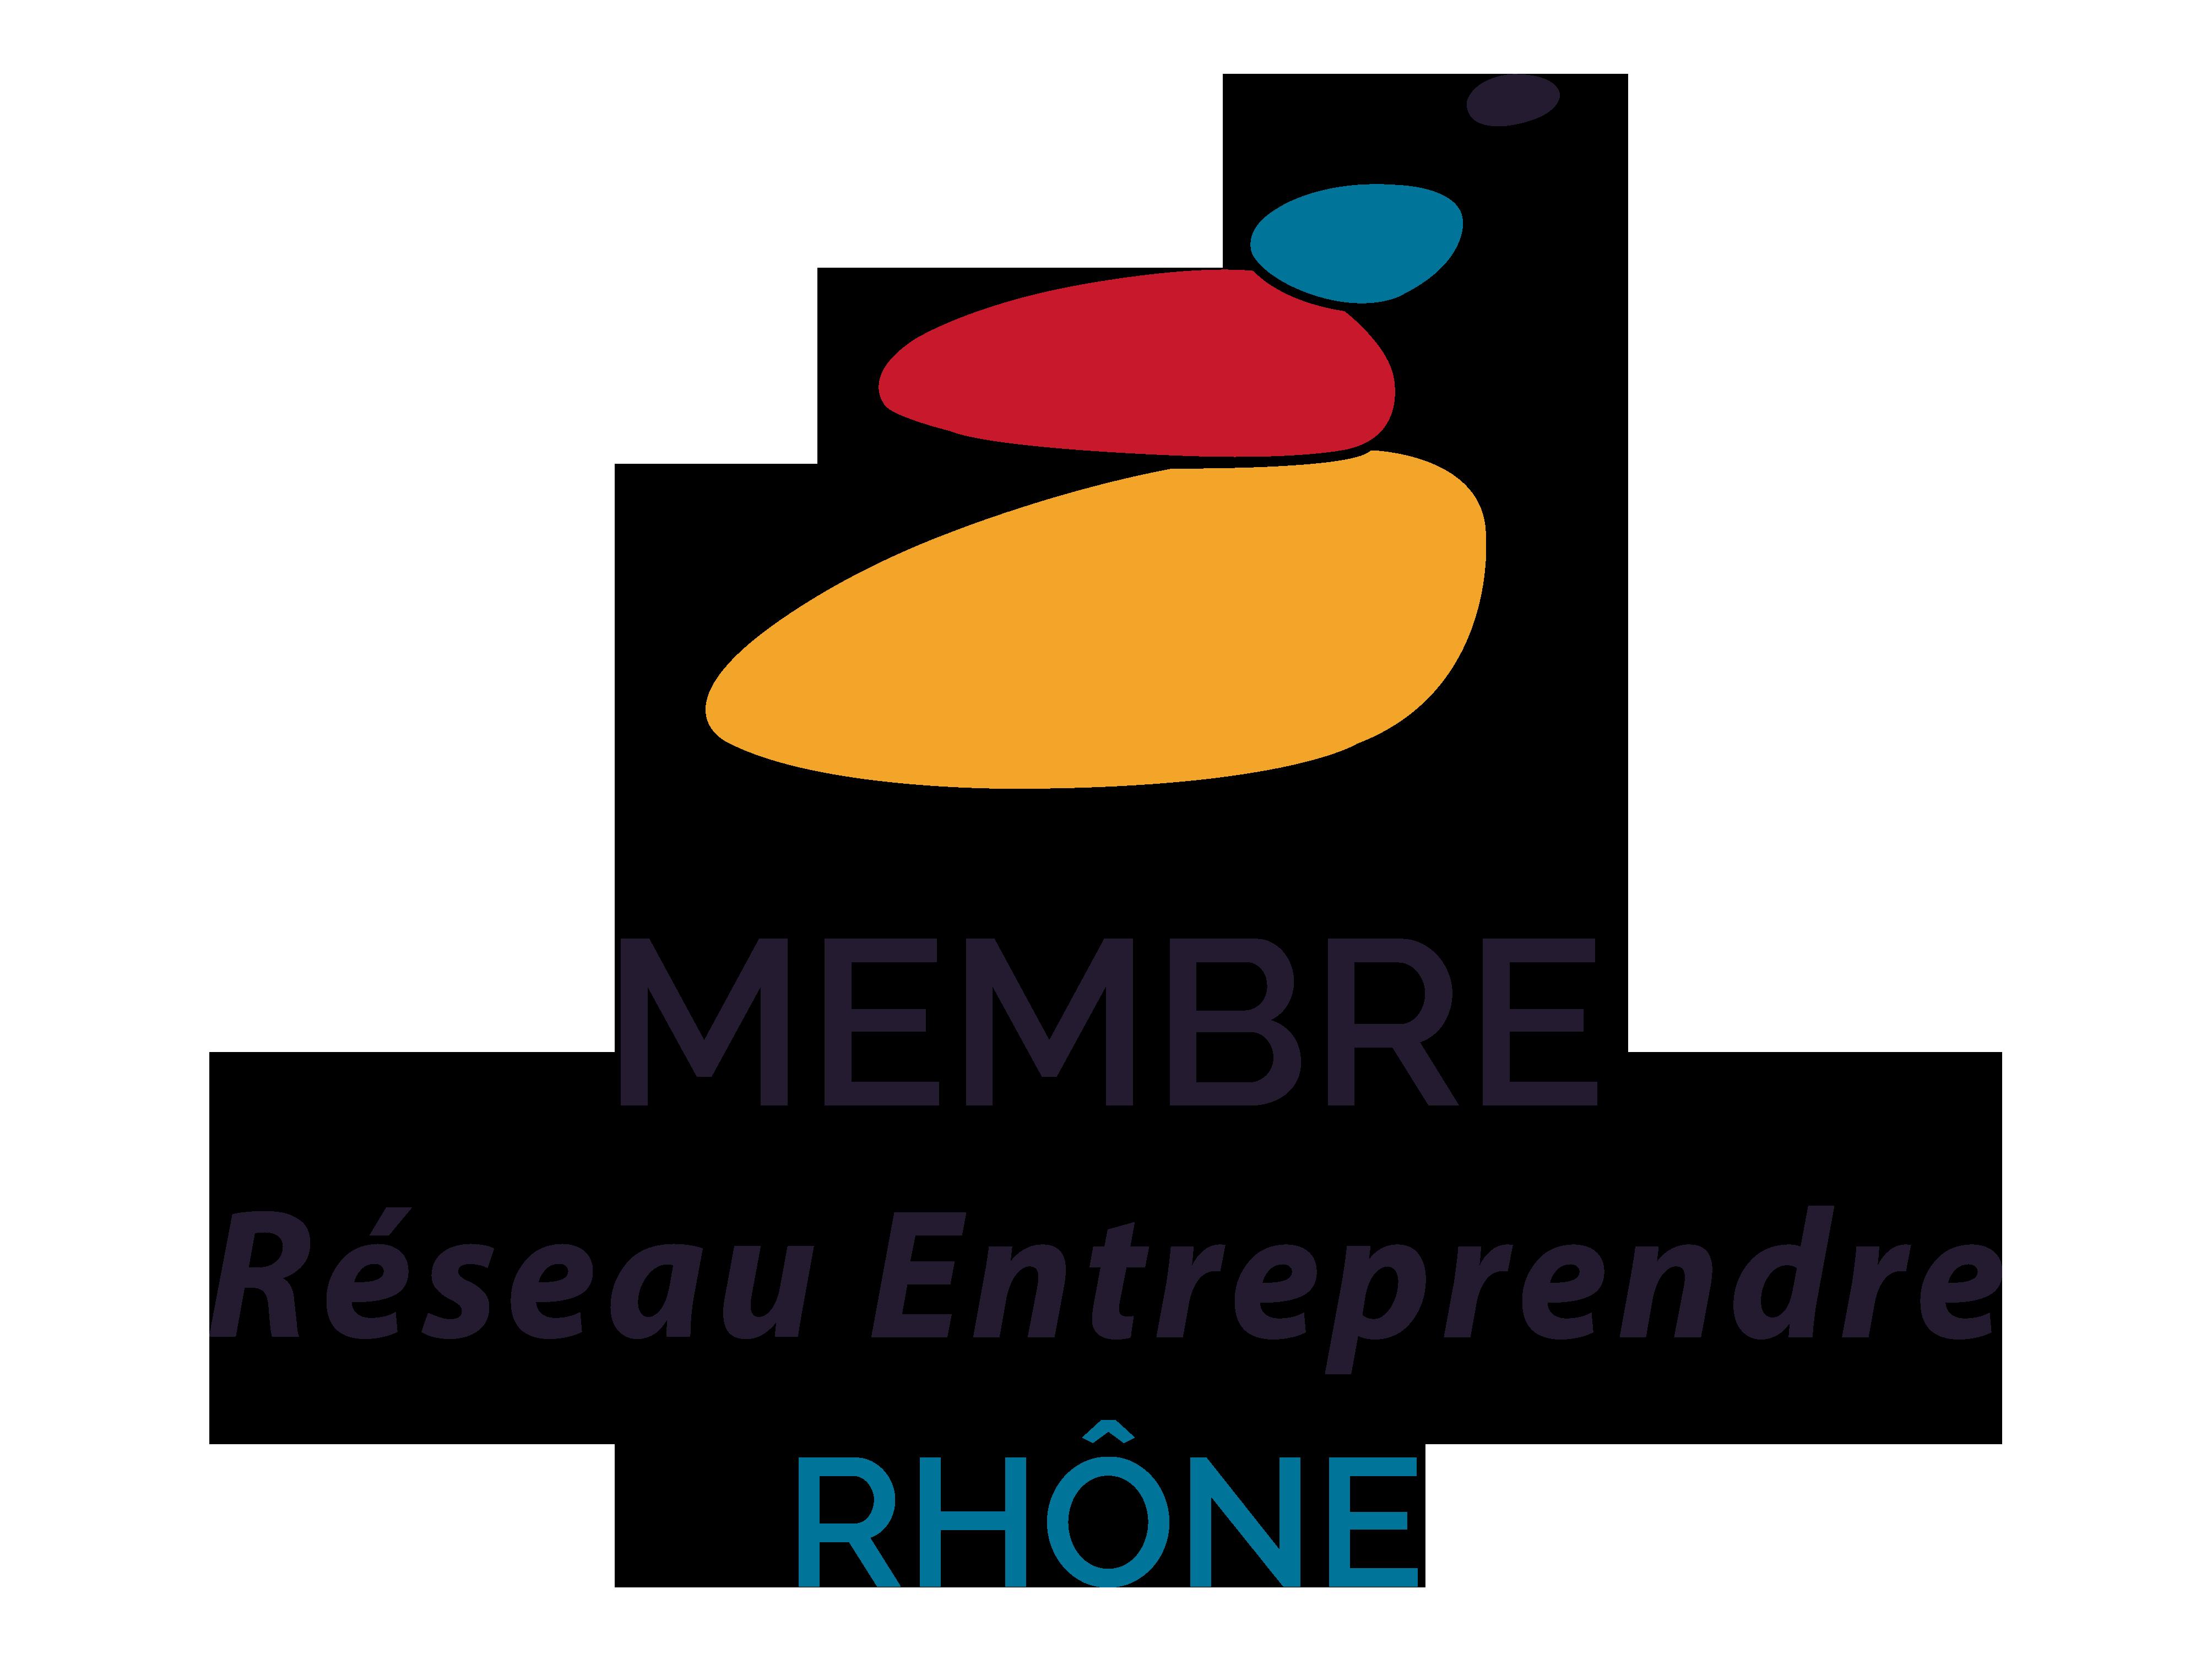 RES HUMANA membre réseau entreprendre Rhone